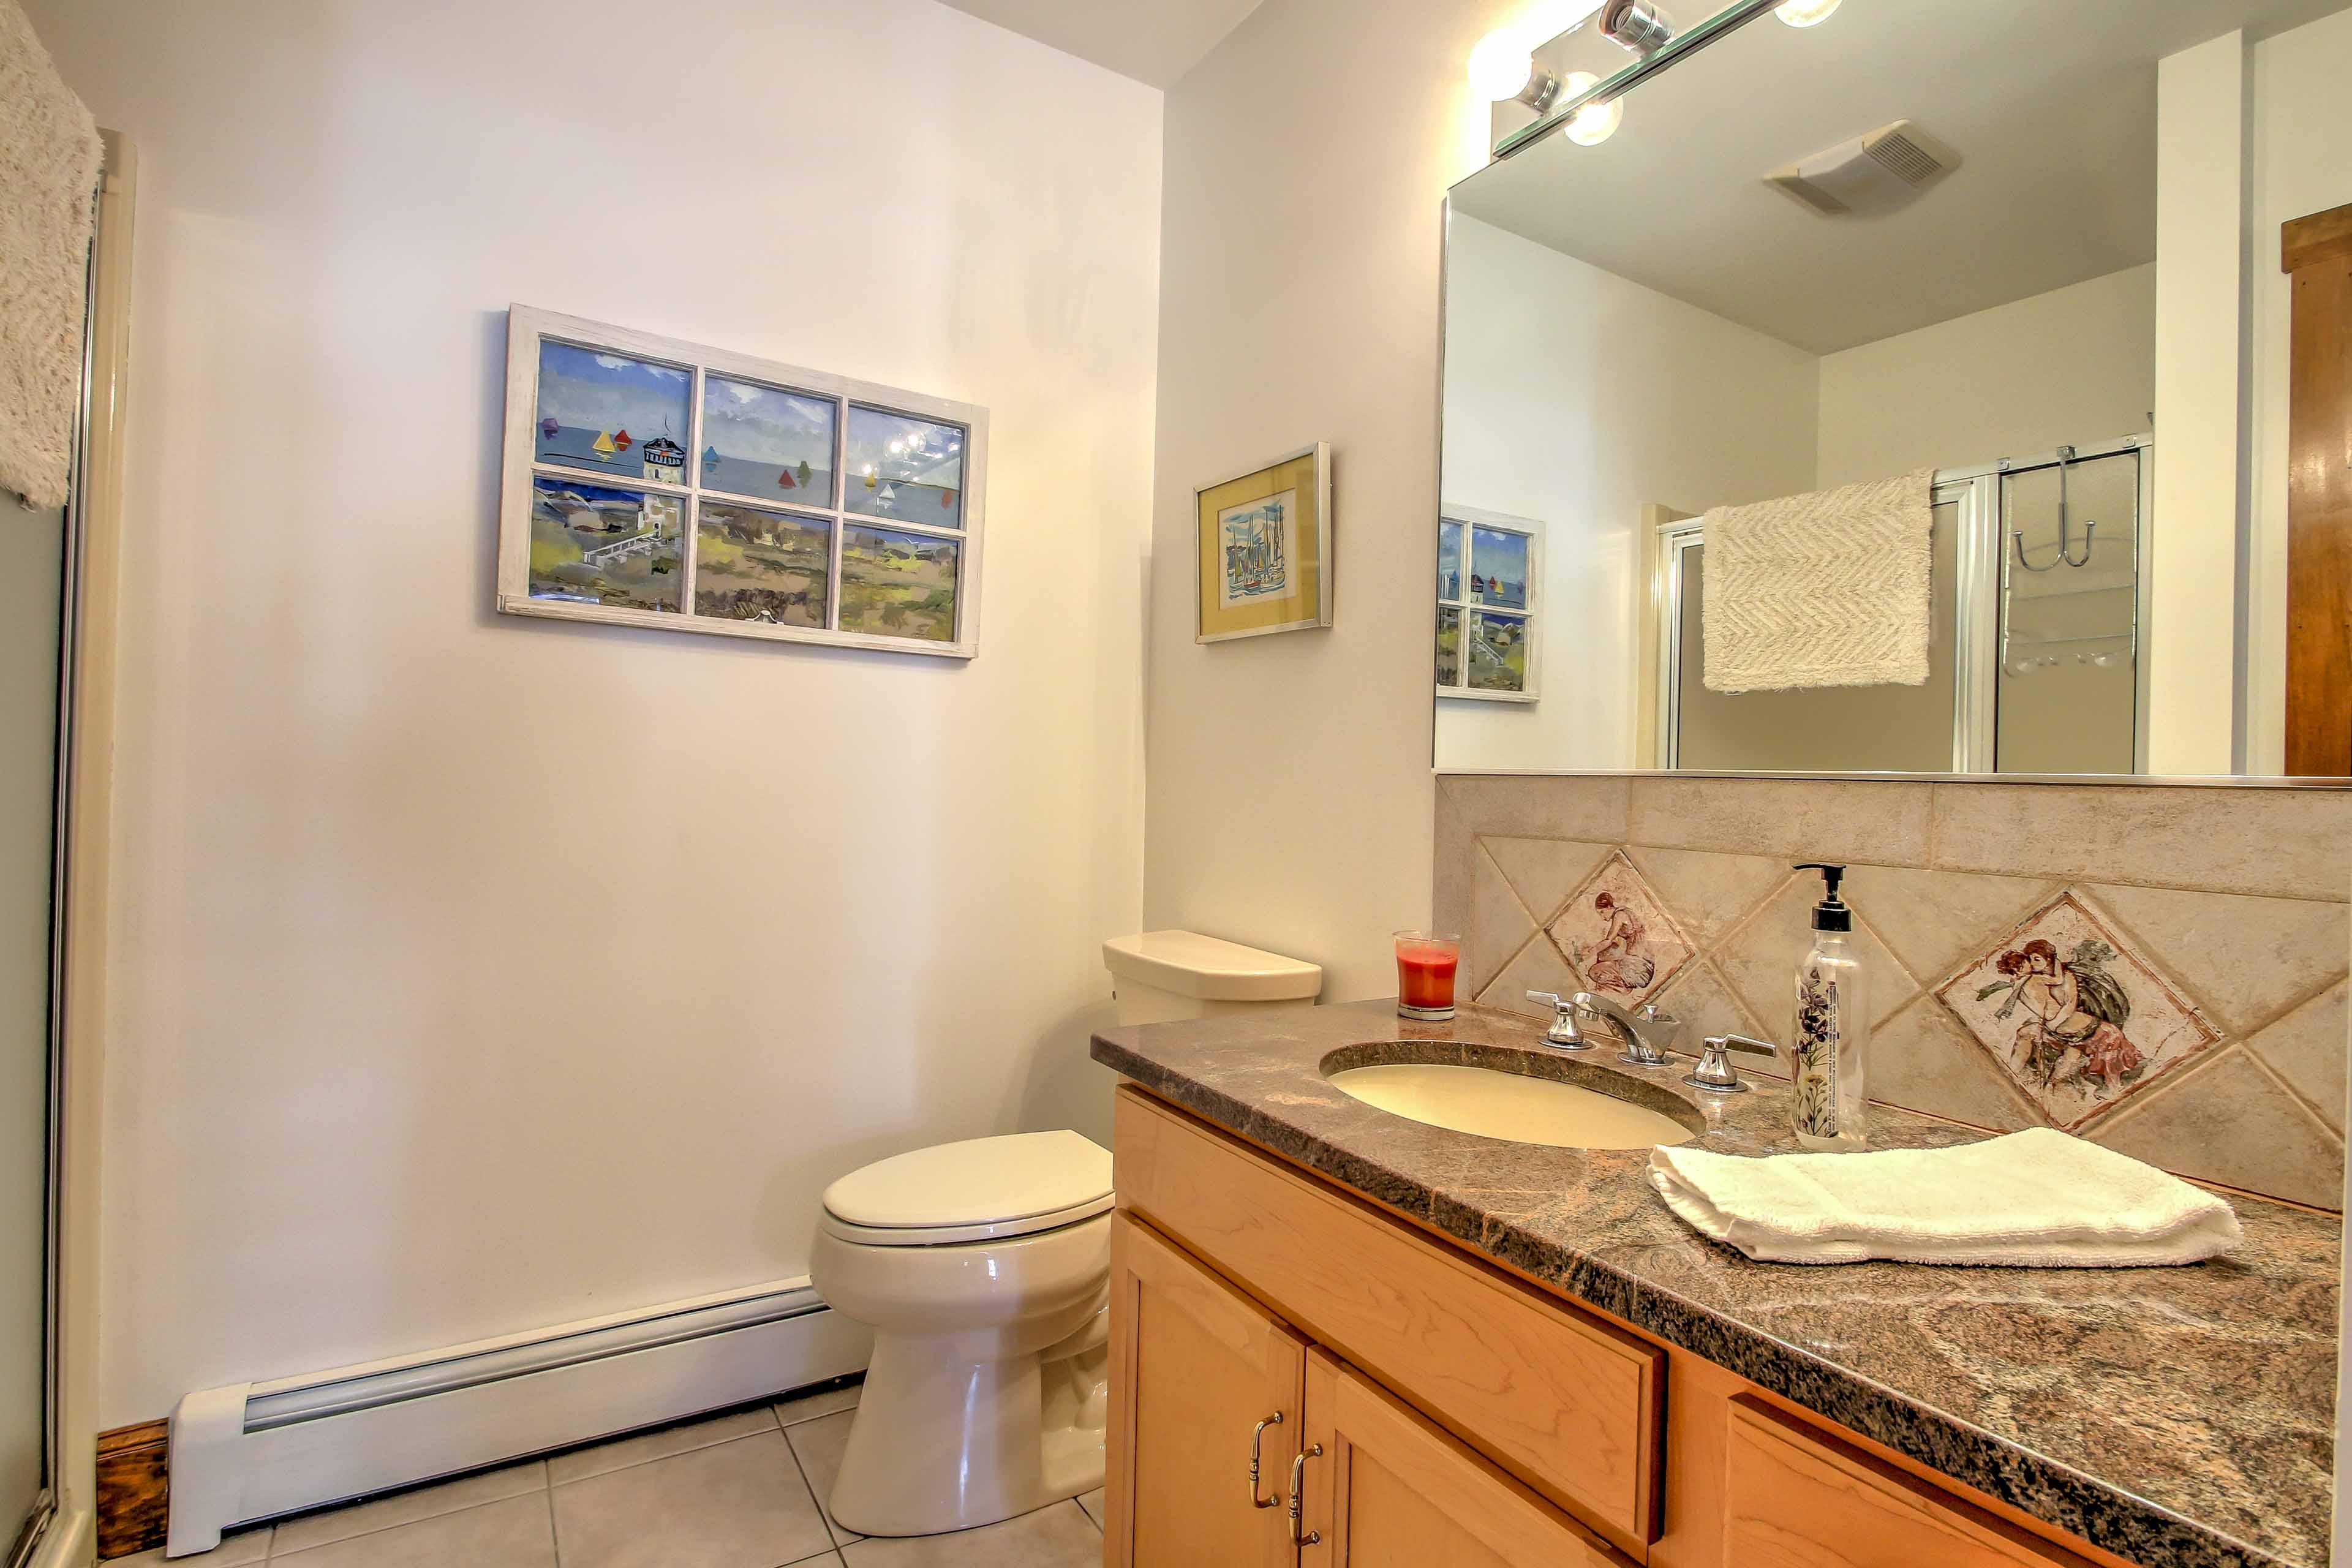 This home has 5 pristine bathrooms.